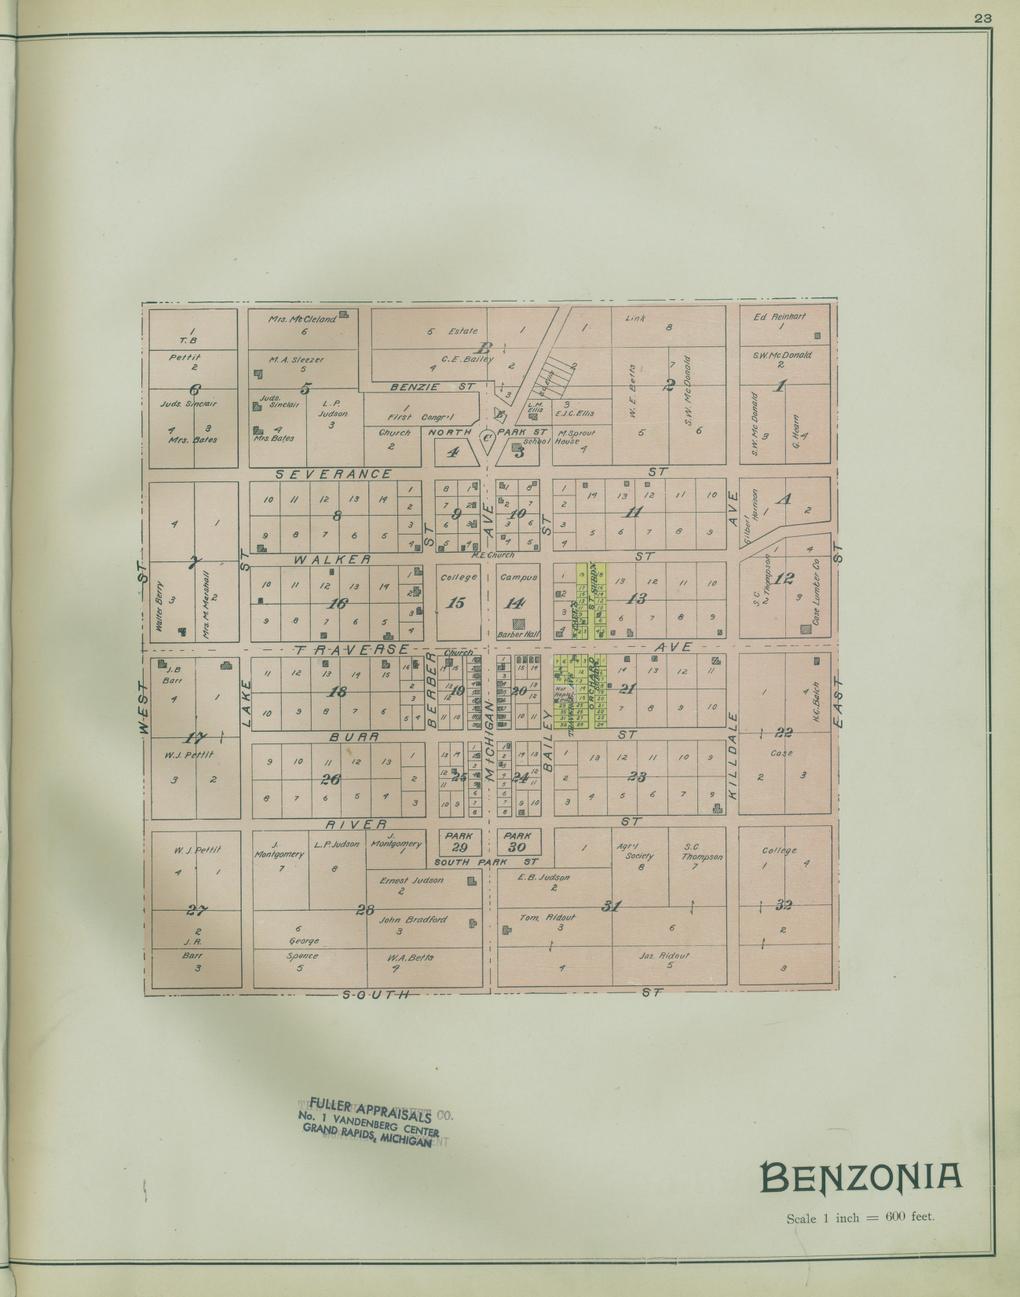 Michigan benzie county benzonia - Plat Of The Village Of Benzonia In 1901 Atlas Of Benzie County Michigan Knoxville Tenn C E Ferris 1901